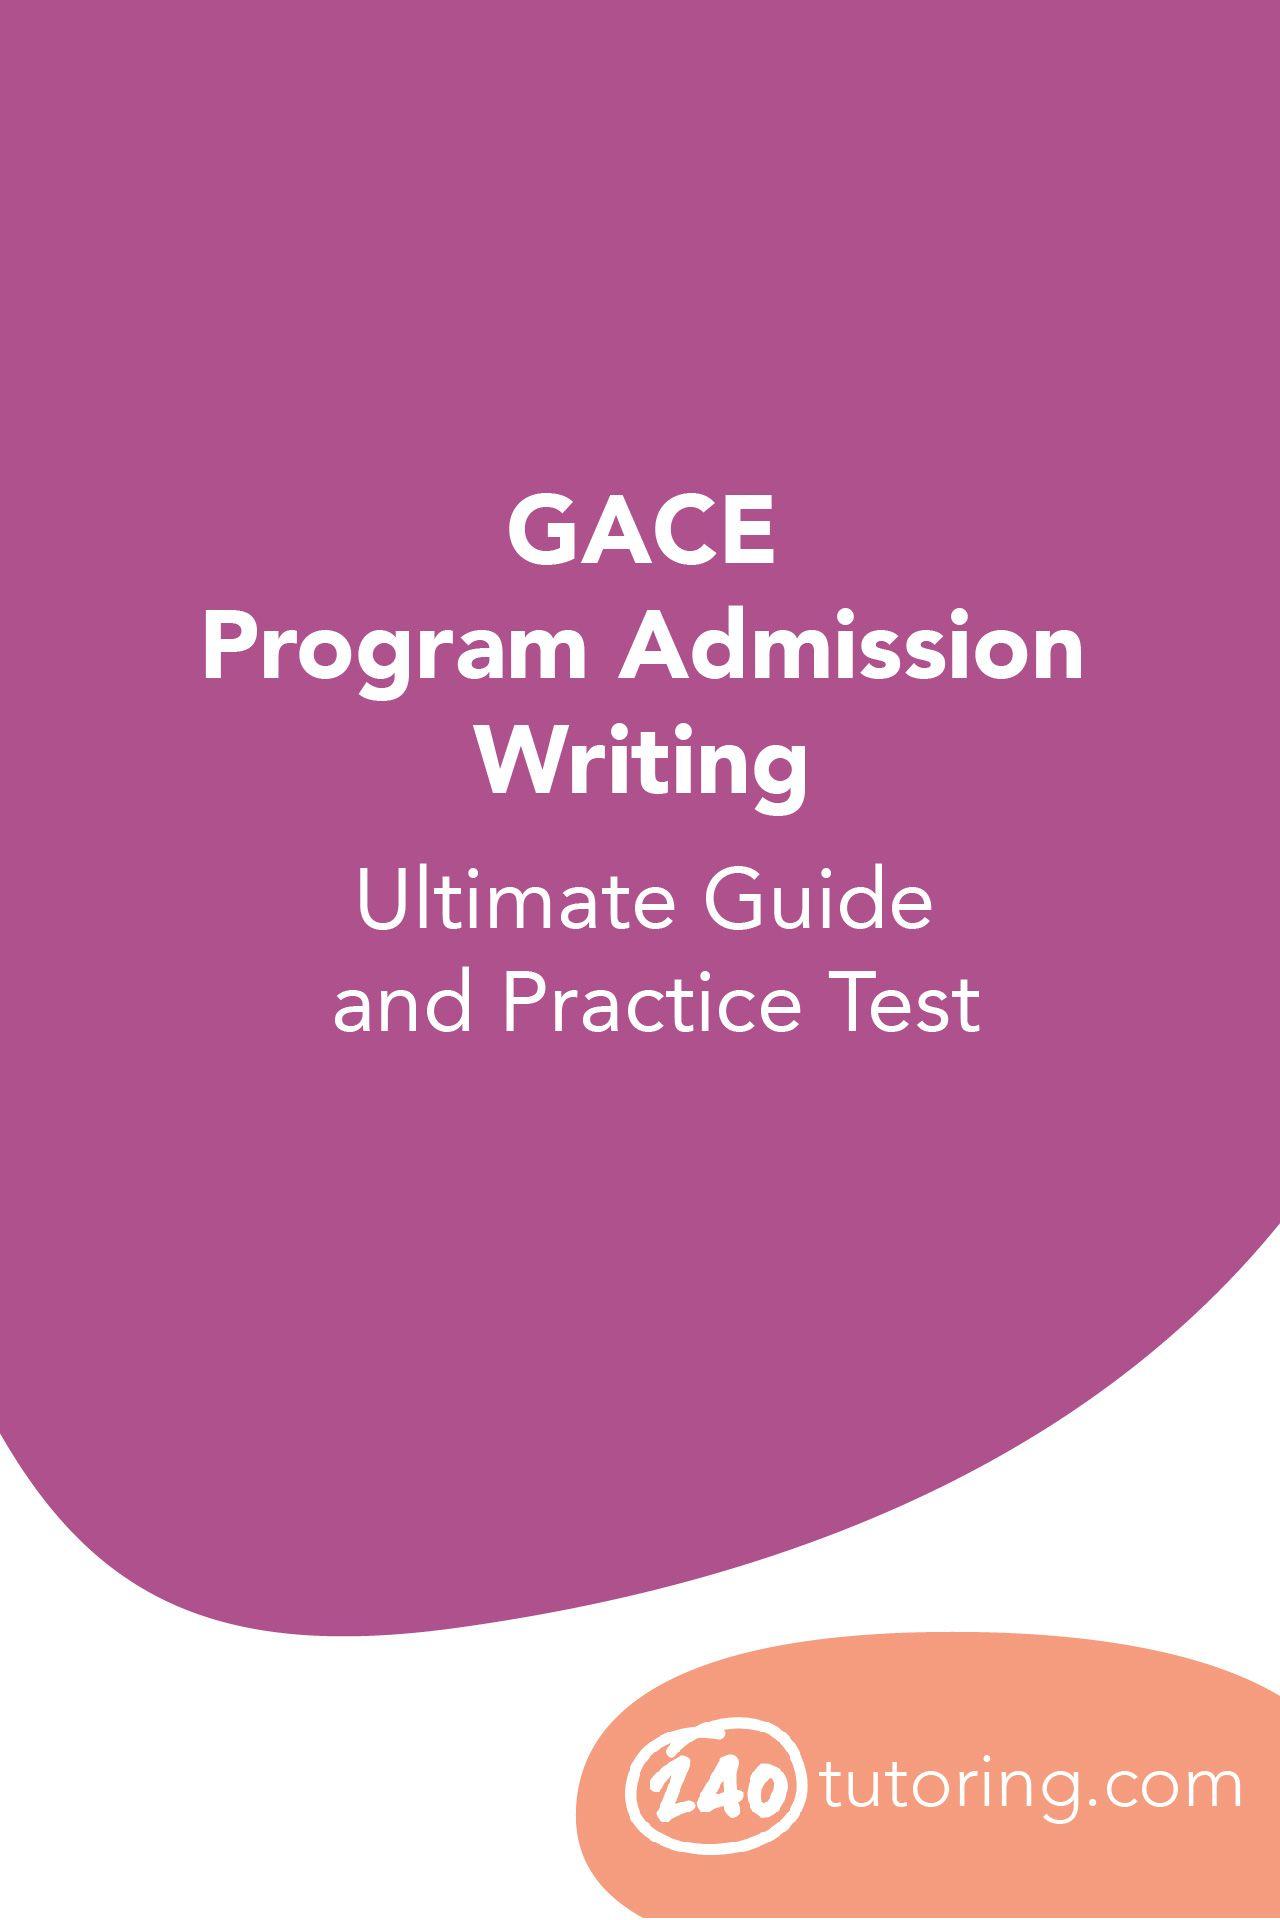 Gace writing help